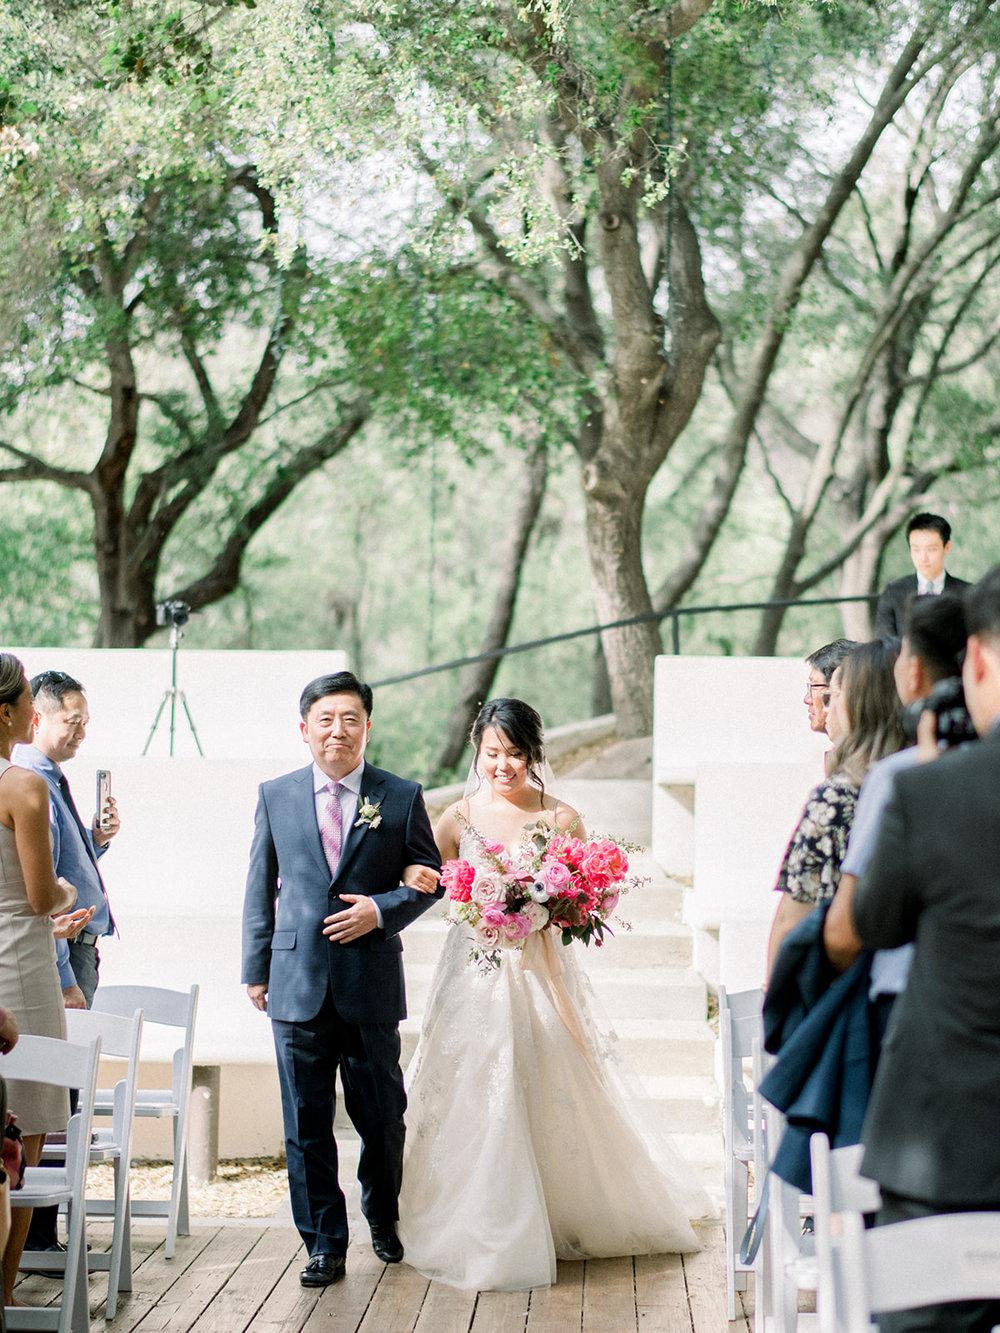 jueunandjon-etherandsmith-wedding-725.jpg